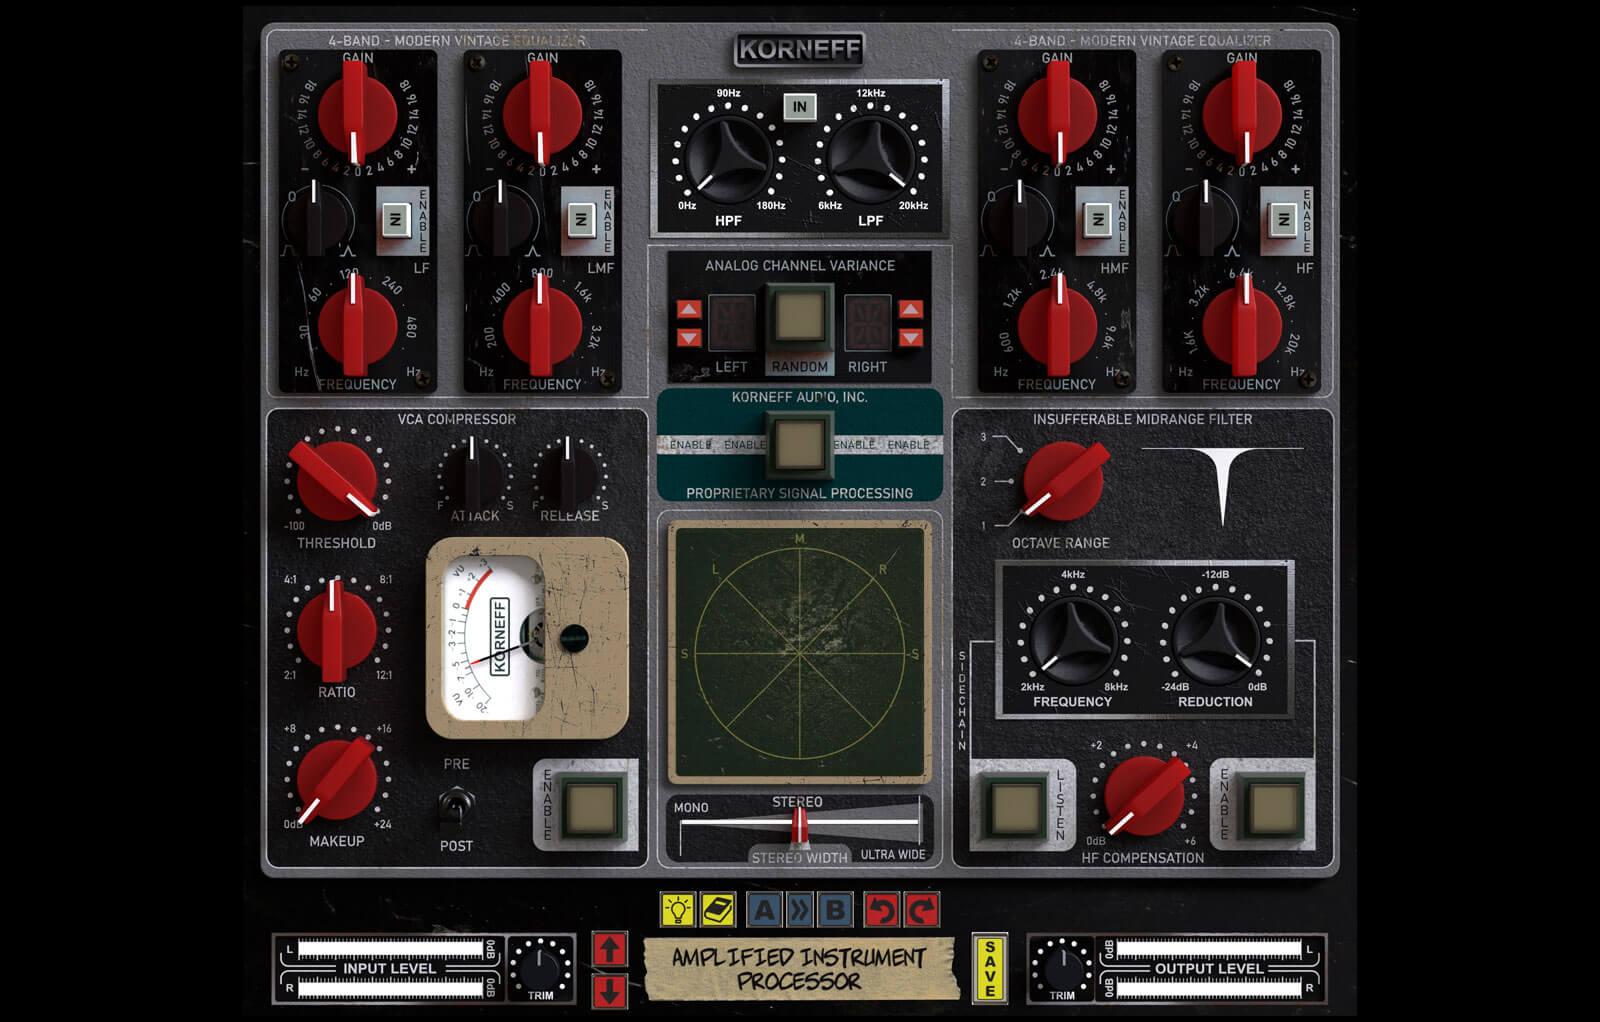 Amplified Instrument Processor